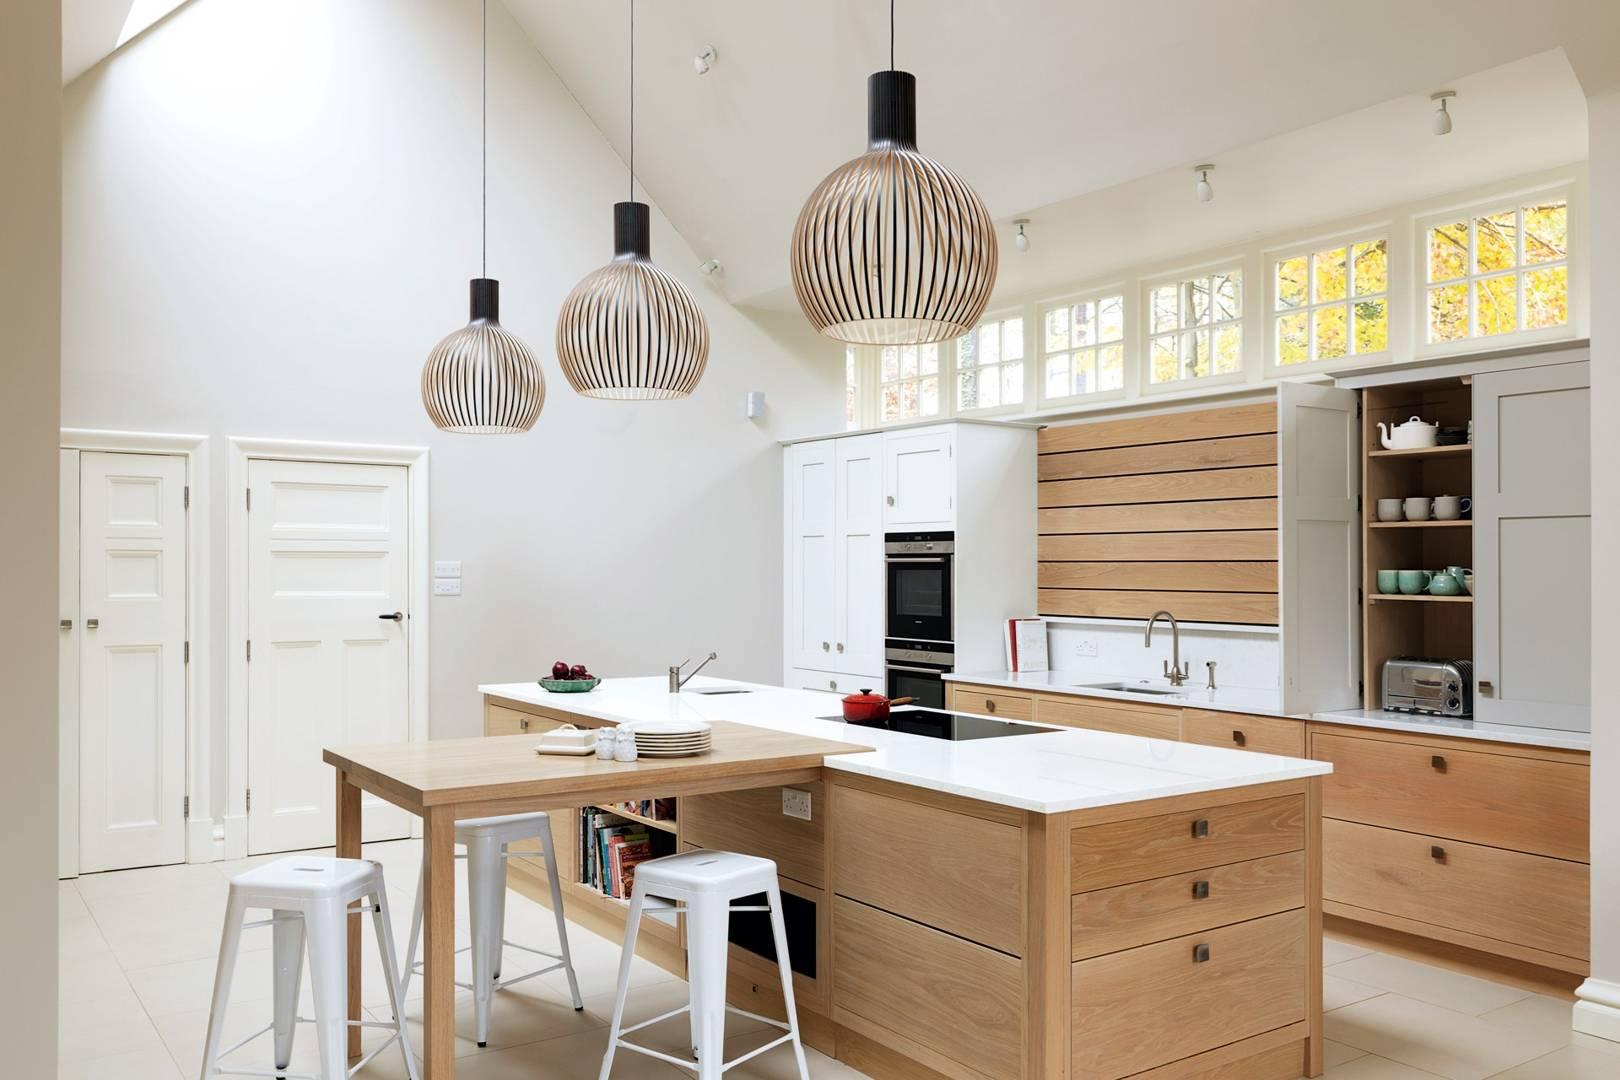 Kitchen Design Ideas, Wood, Marble - Kitchen Decor Ideas & Images ...